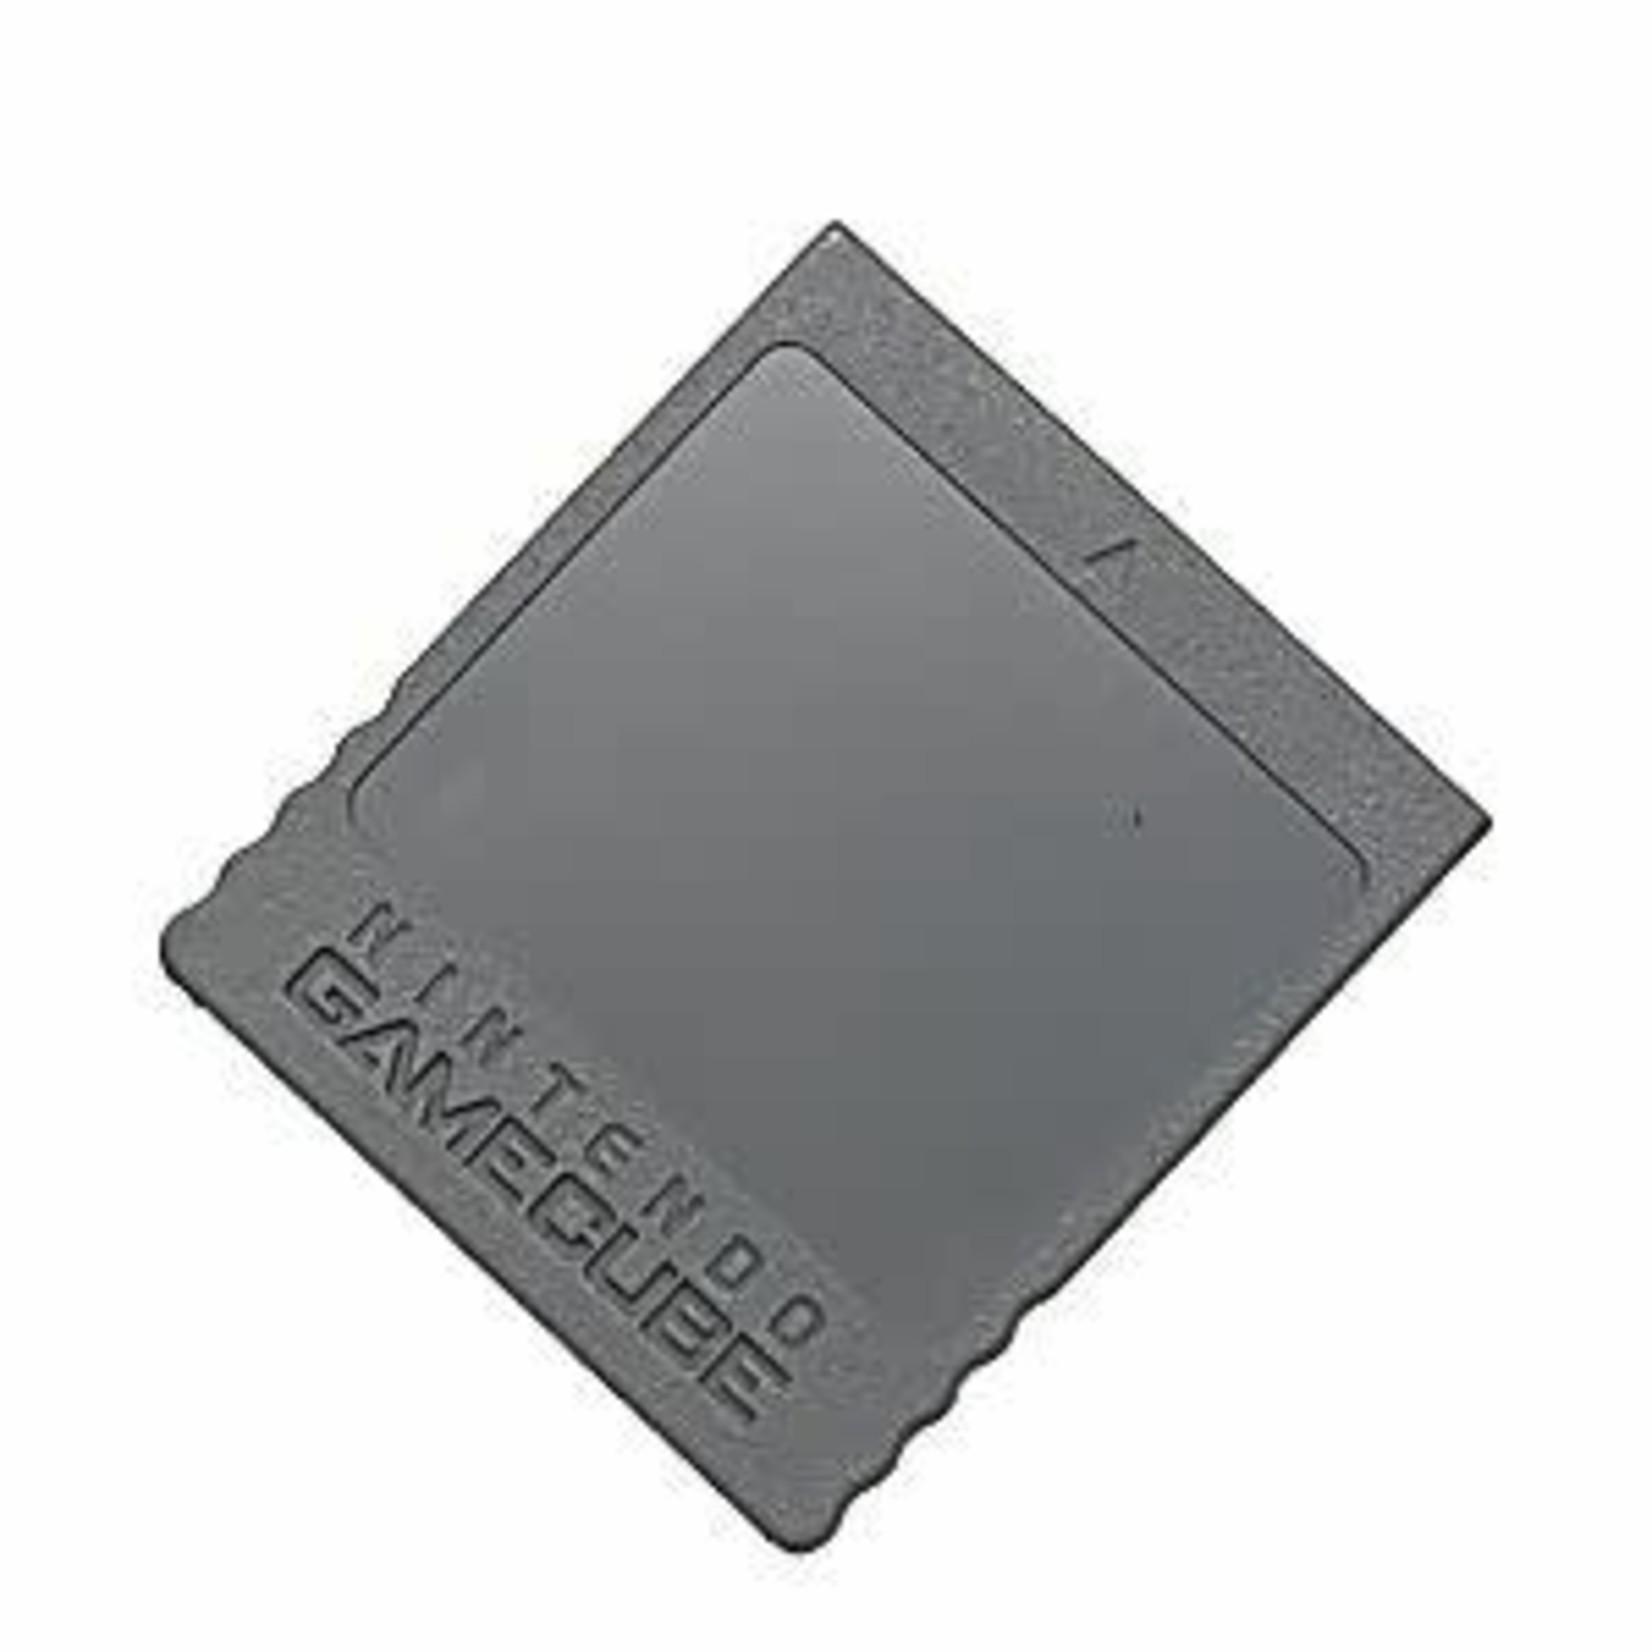 GCU-USED GAMECUBE MEMORY CARD